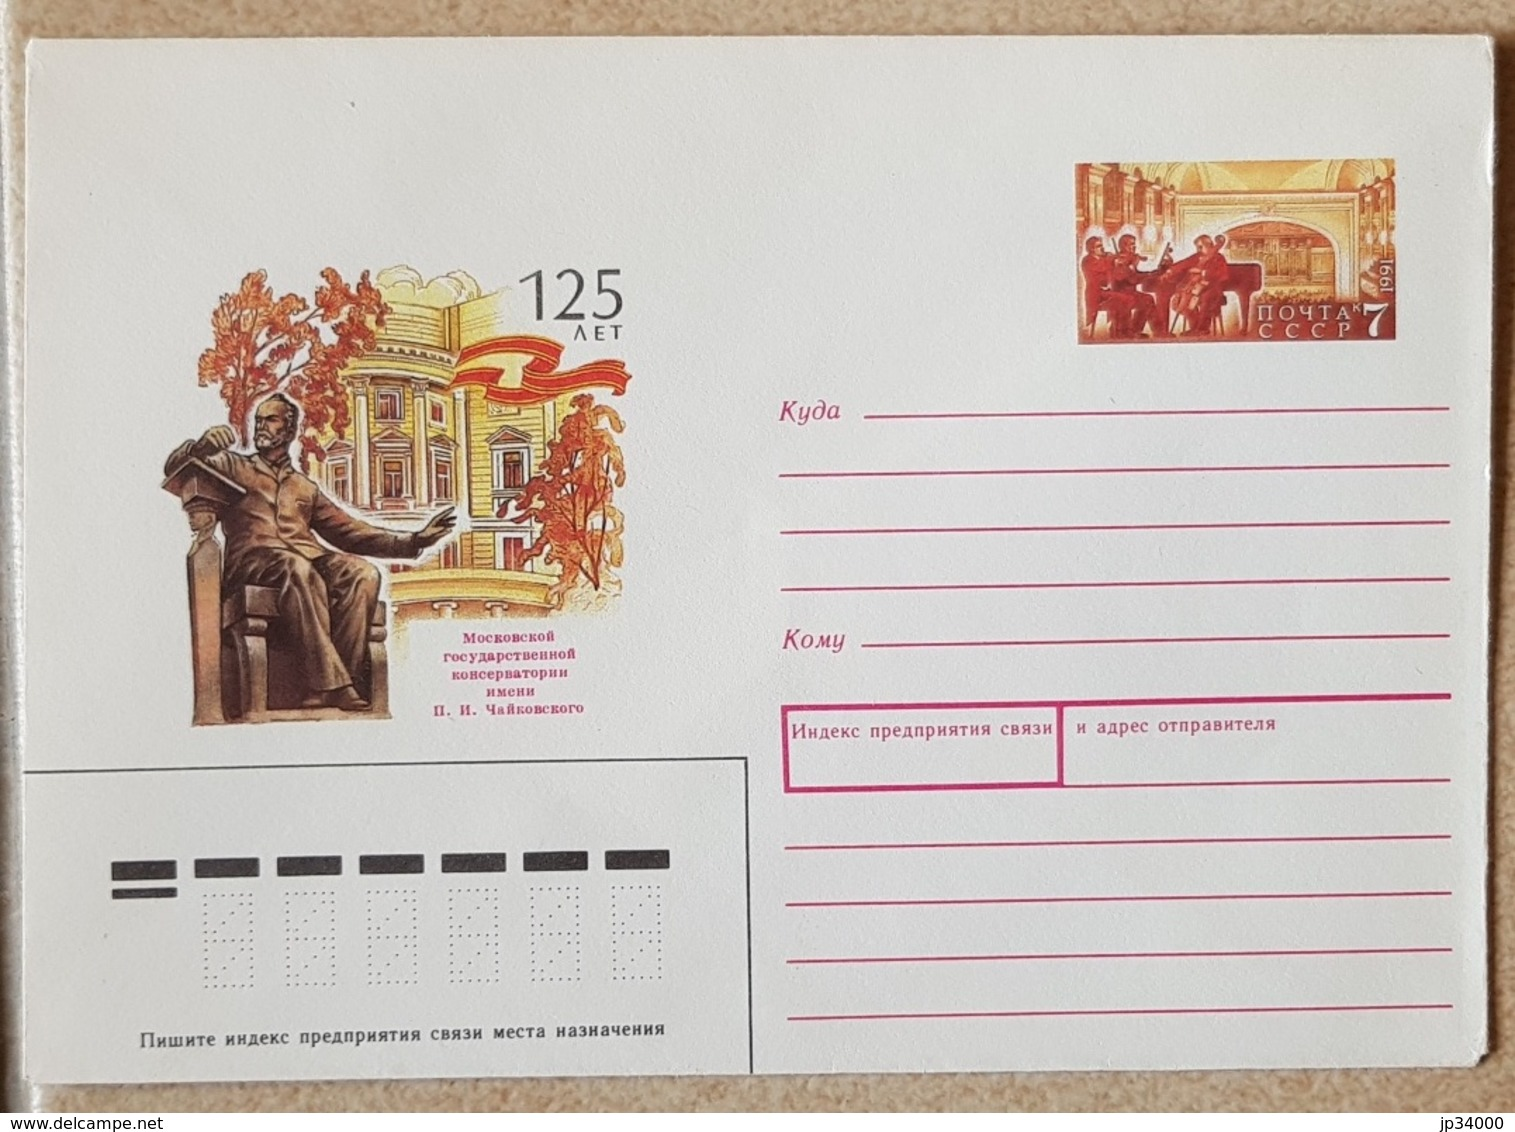 RUSSIE Ex URSS: Musique, Musica, Music, Entier Postal Neuf Emis En 1991: Tchaikovsky, Violon, Contrebasse, Piano - Musique